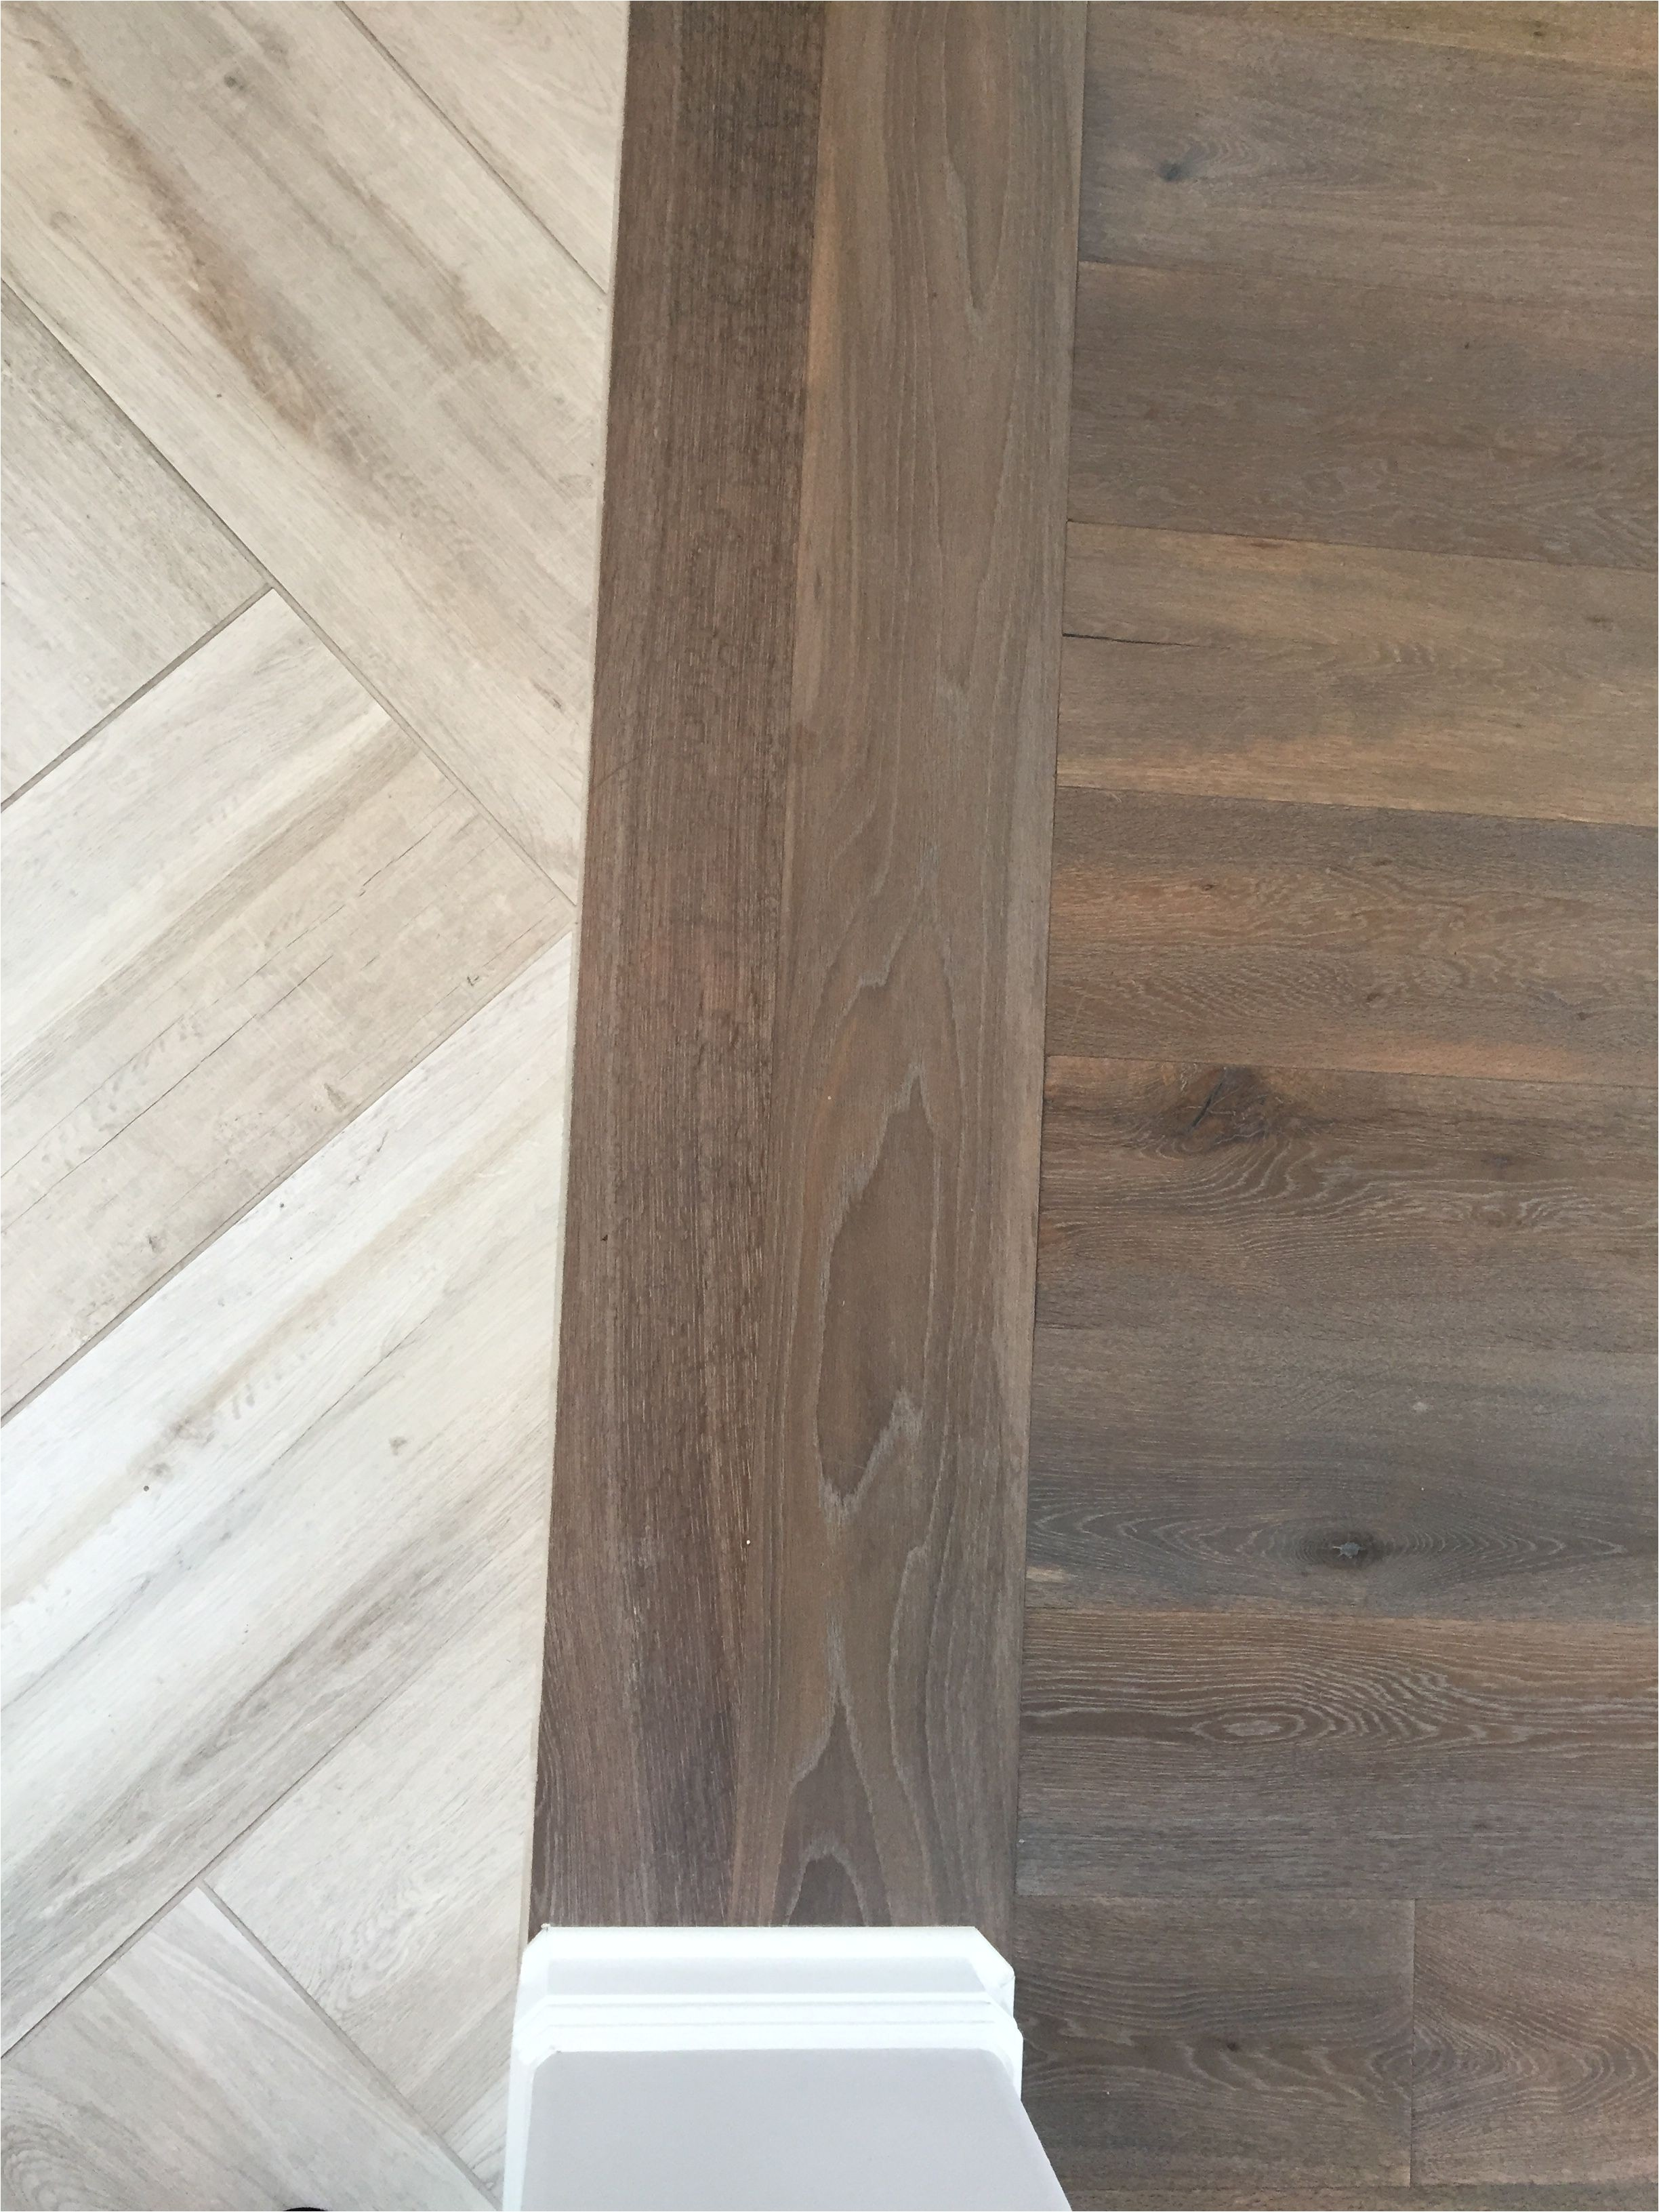 floor transition laminate to herringbone tile pattern